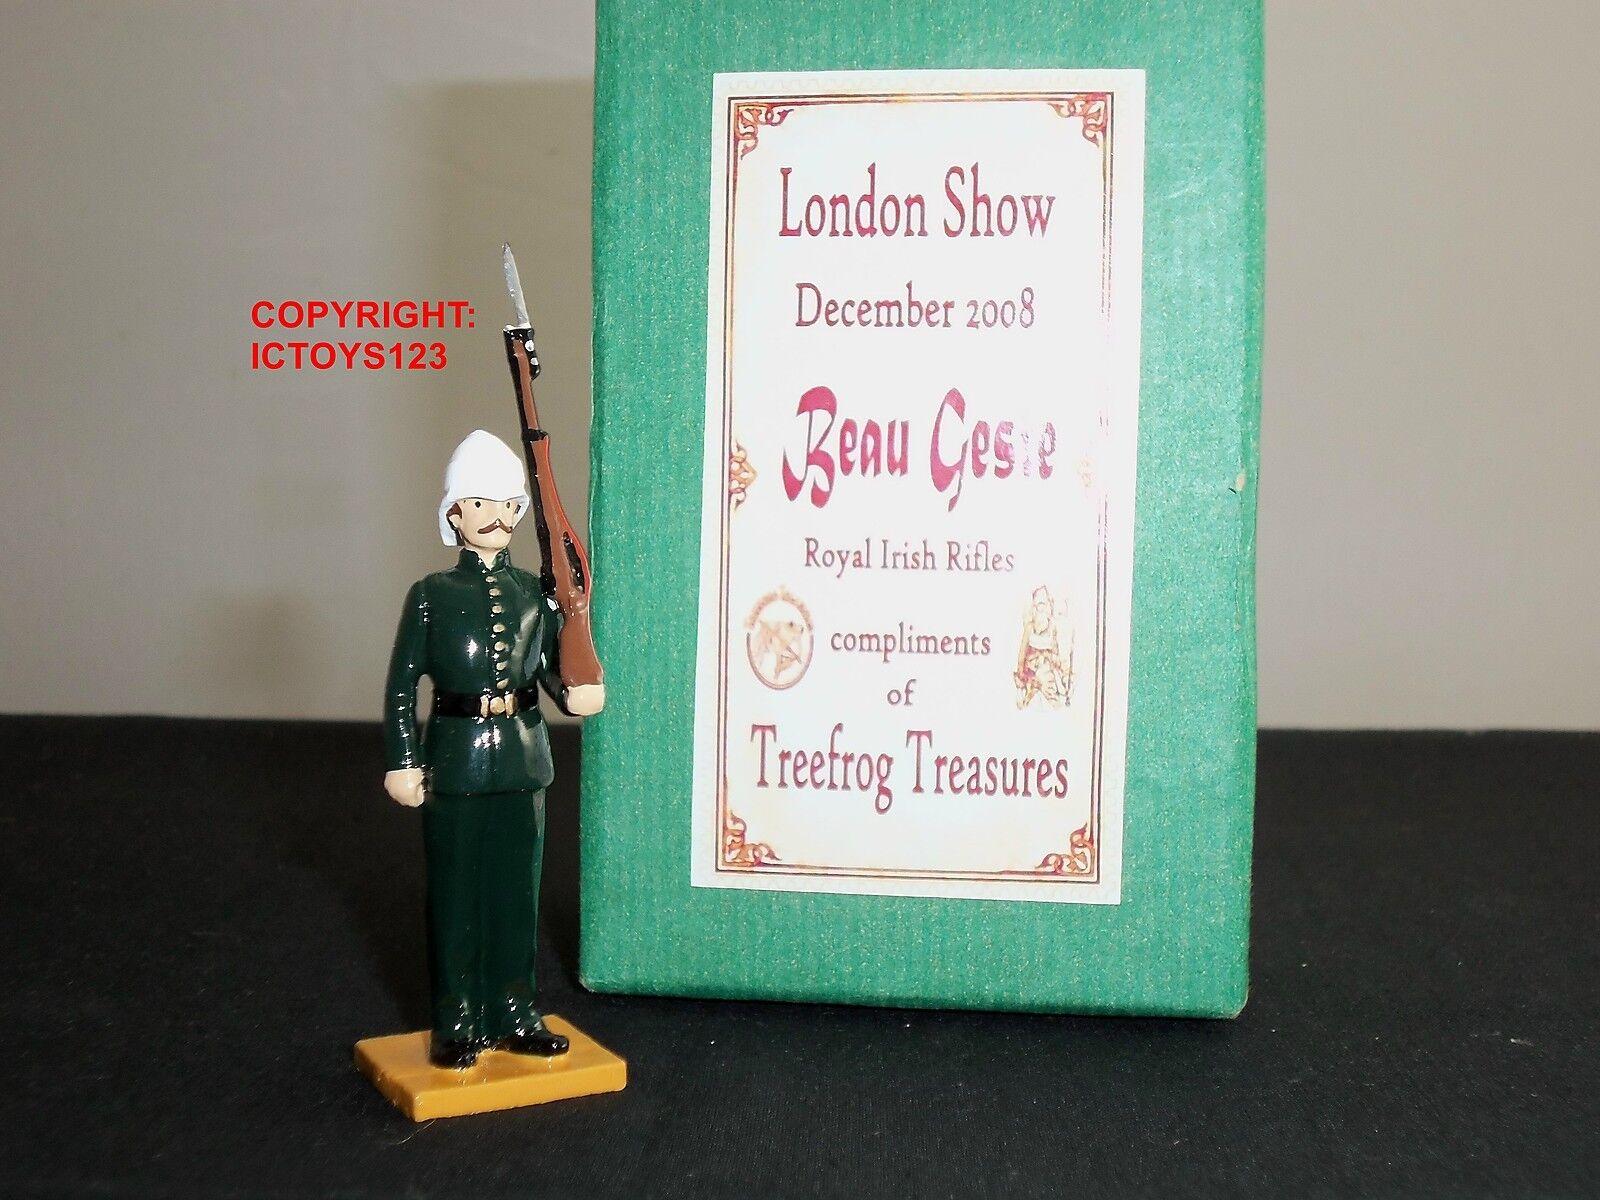 BEAU GESTE ROYAL IRISH RIFLES LONDON SHOW 2008 METAL TOY SOLDIER FIGURE